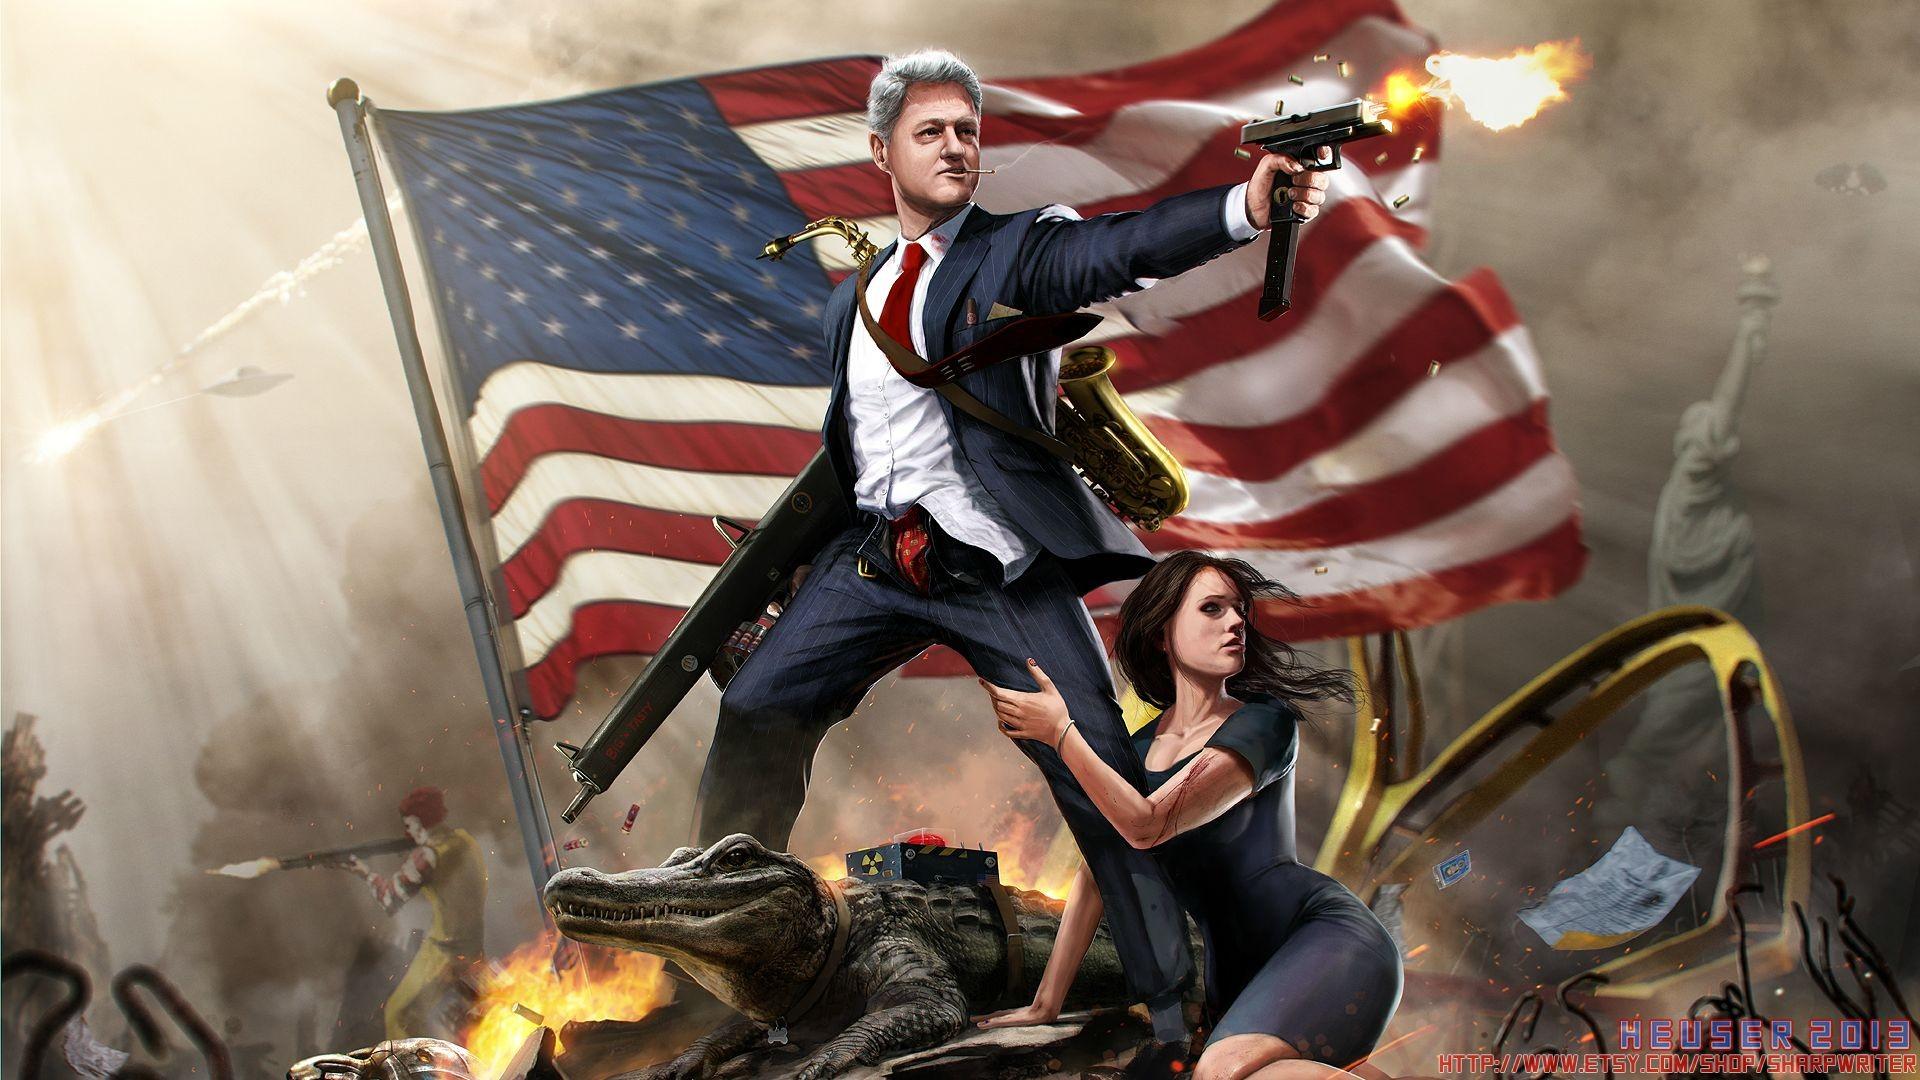 Politics: Artistic, Fantasy, President, American Flag, Bill Clinton